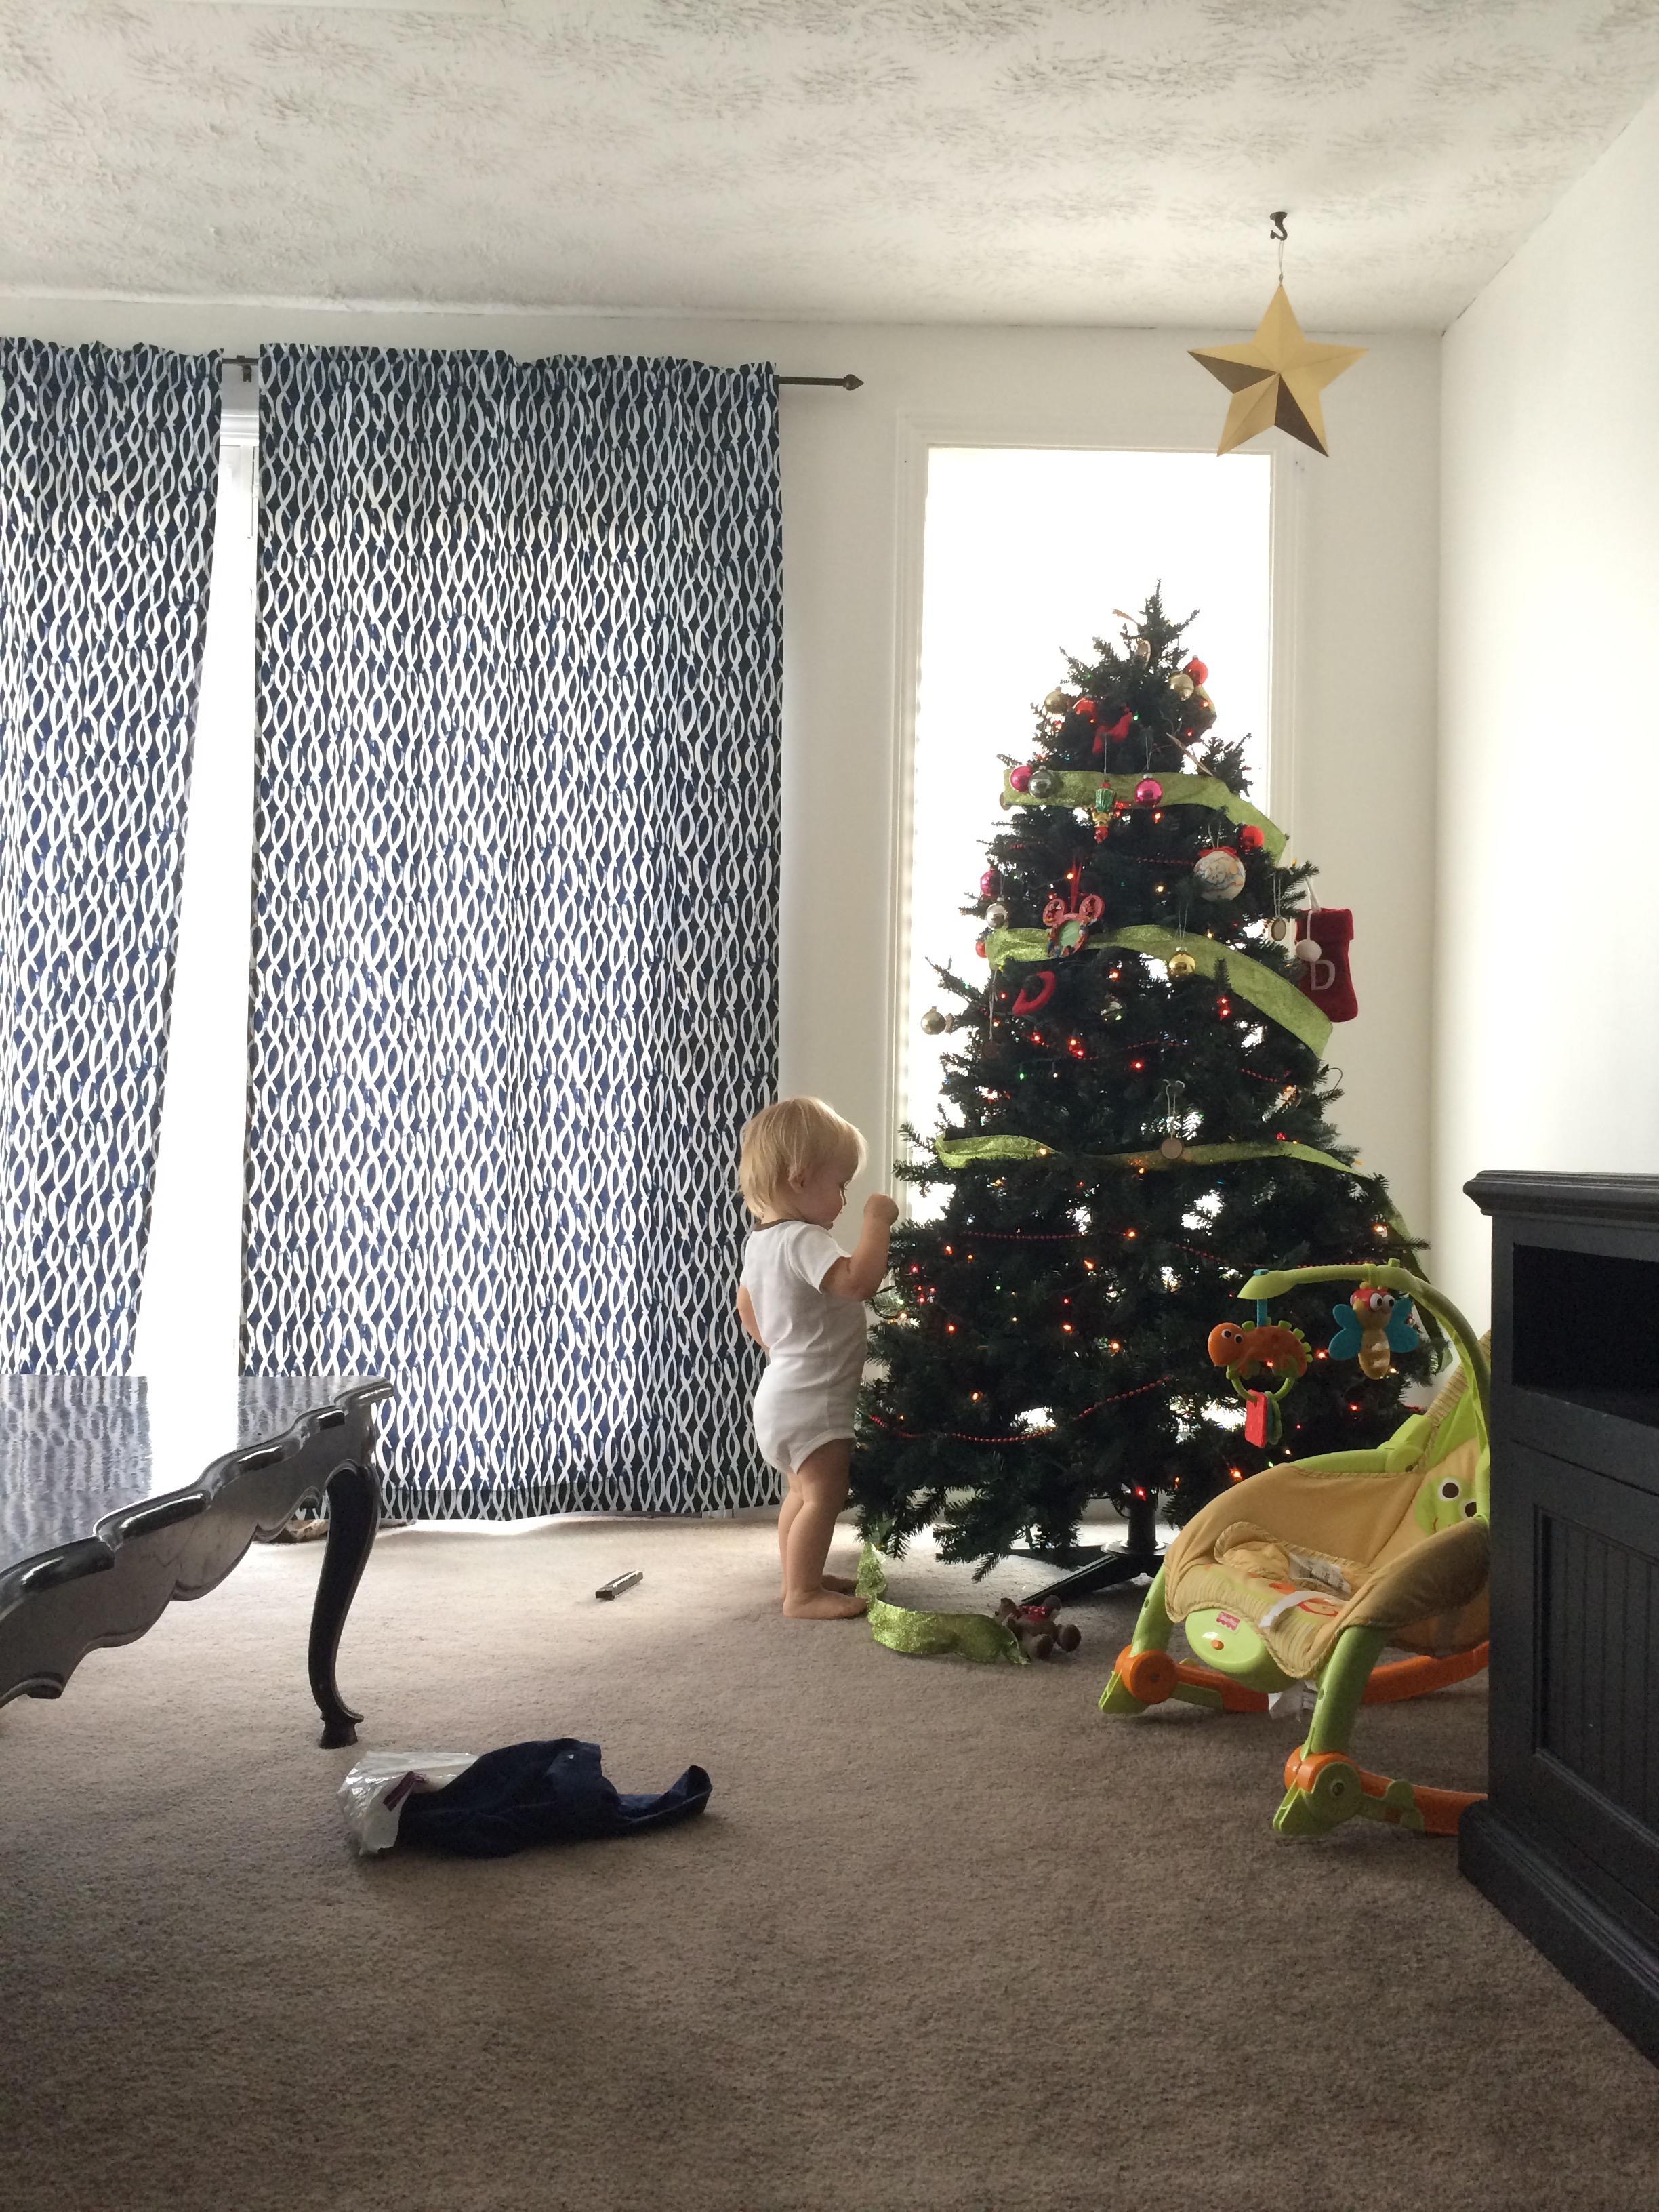 Adult swim hookup a gamer encouragements images of christmas